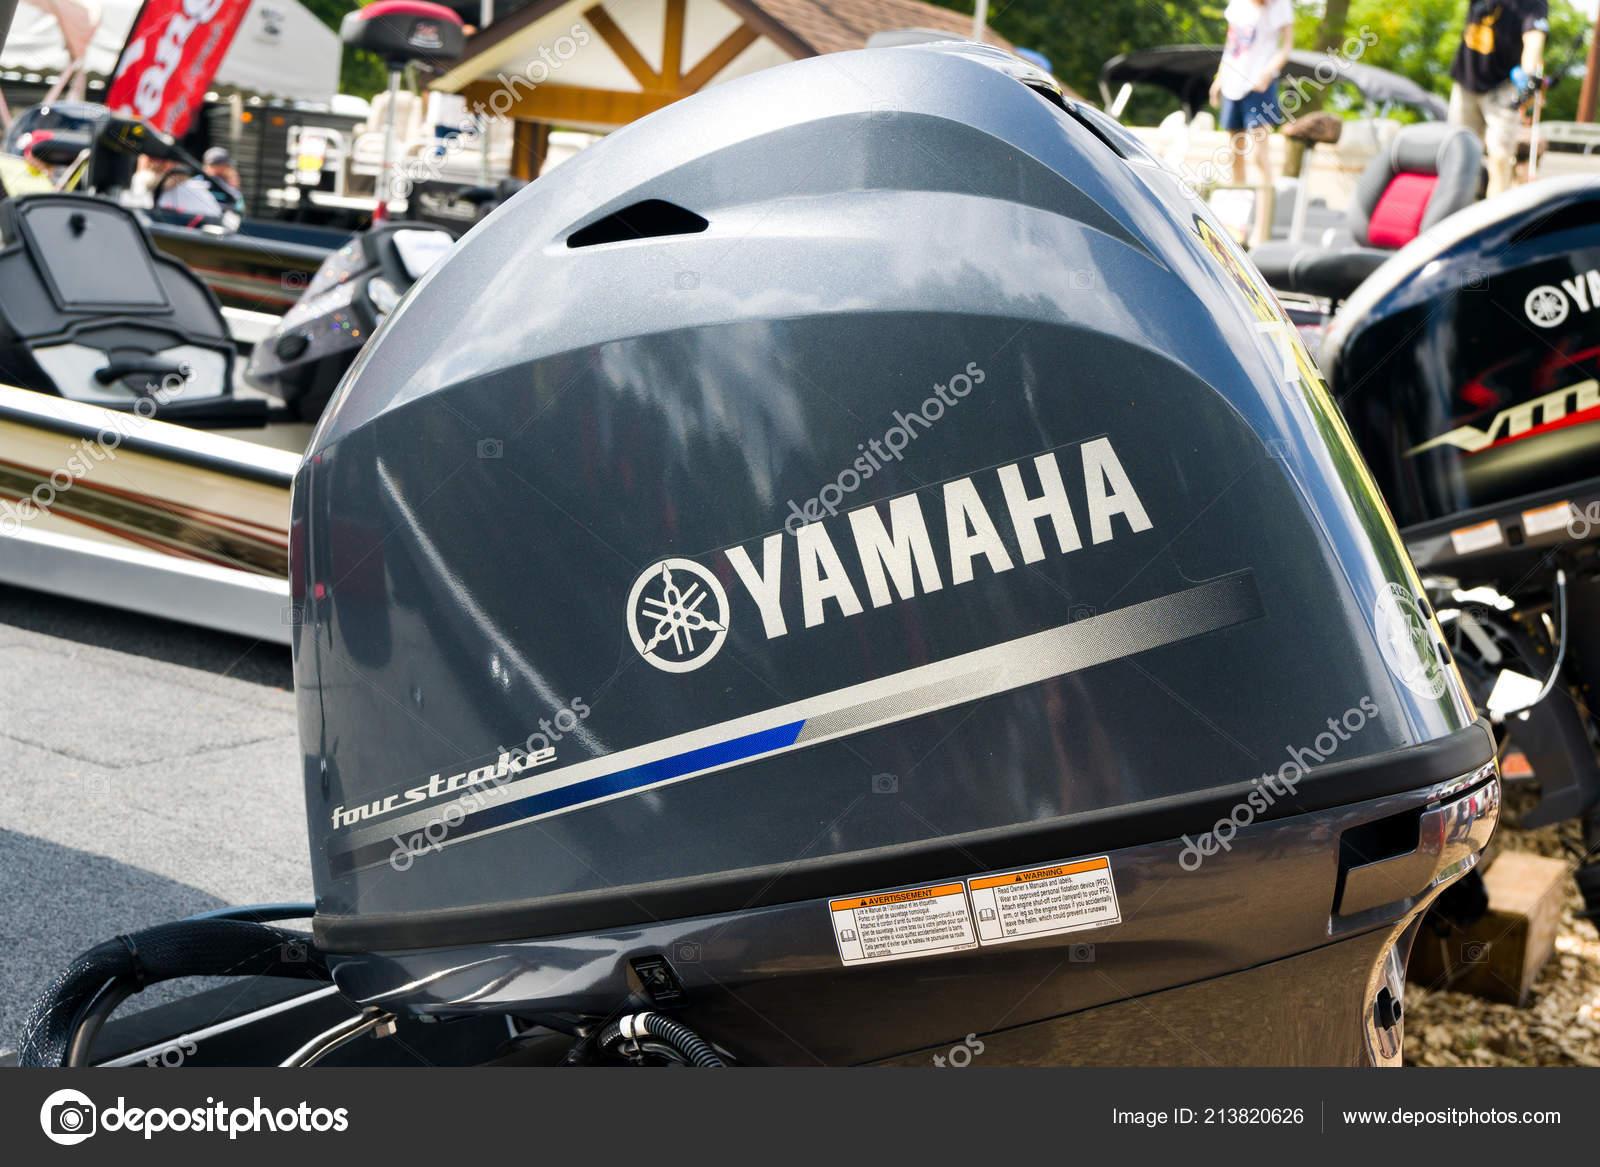 Paul Usa August 2018 Yamaha Außenbordmotor Logo Und Markenzeichen Yamaha — Stockfoto